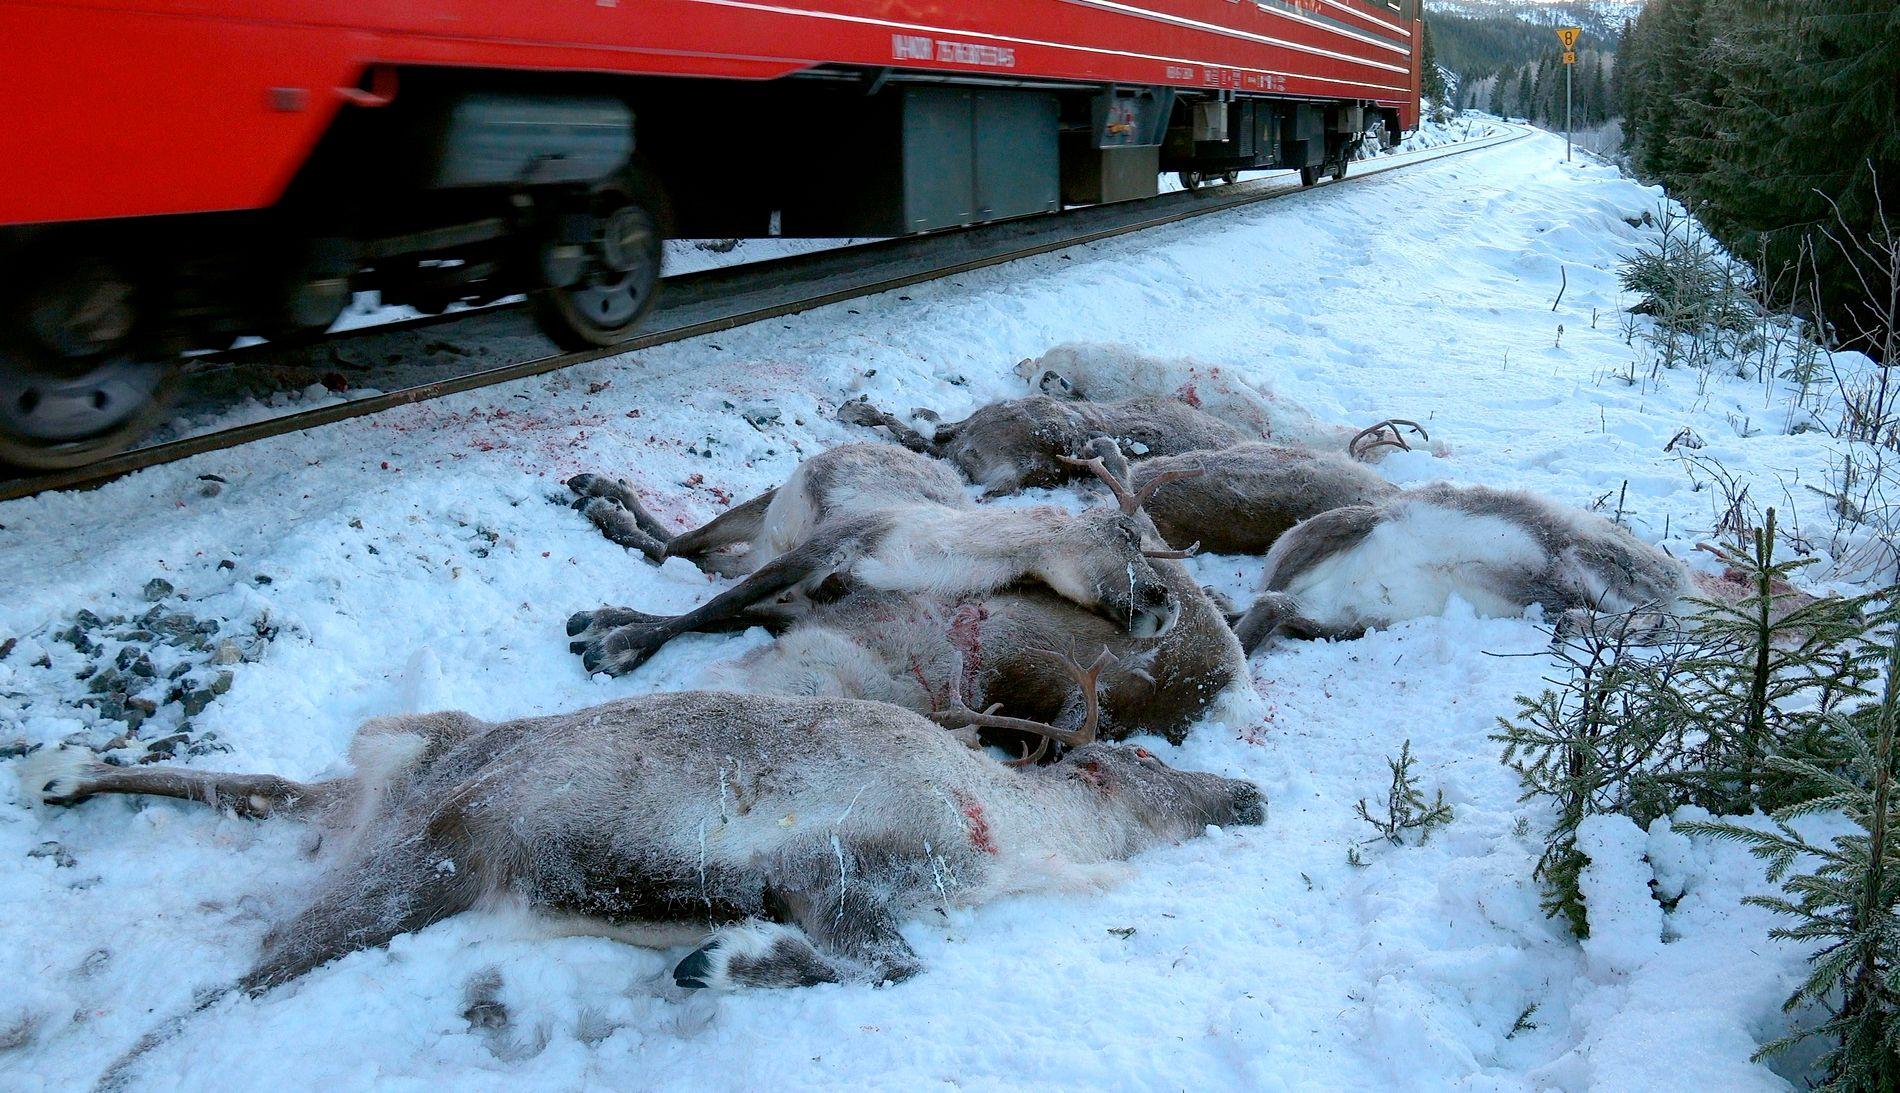 DYRETRAGEDIE: Kadaverne lå i hauger langs jernbanesporet etter påkjørselen 25. november ved Mosjøen. Foto: NTB SCANPIX / John Erling Utsi